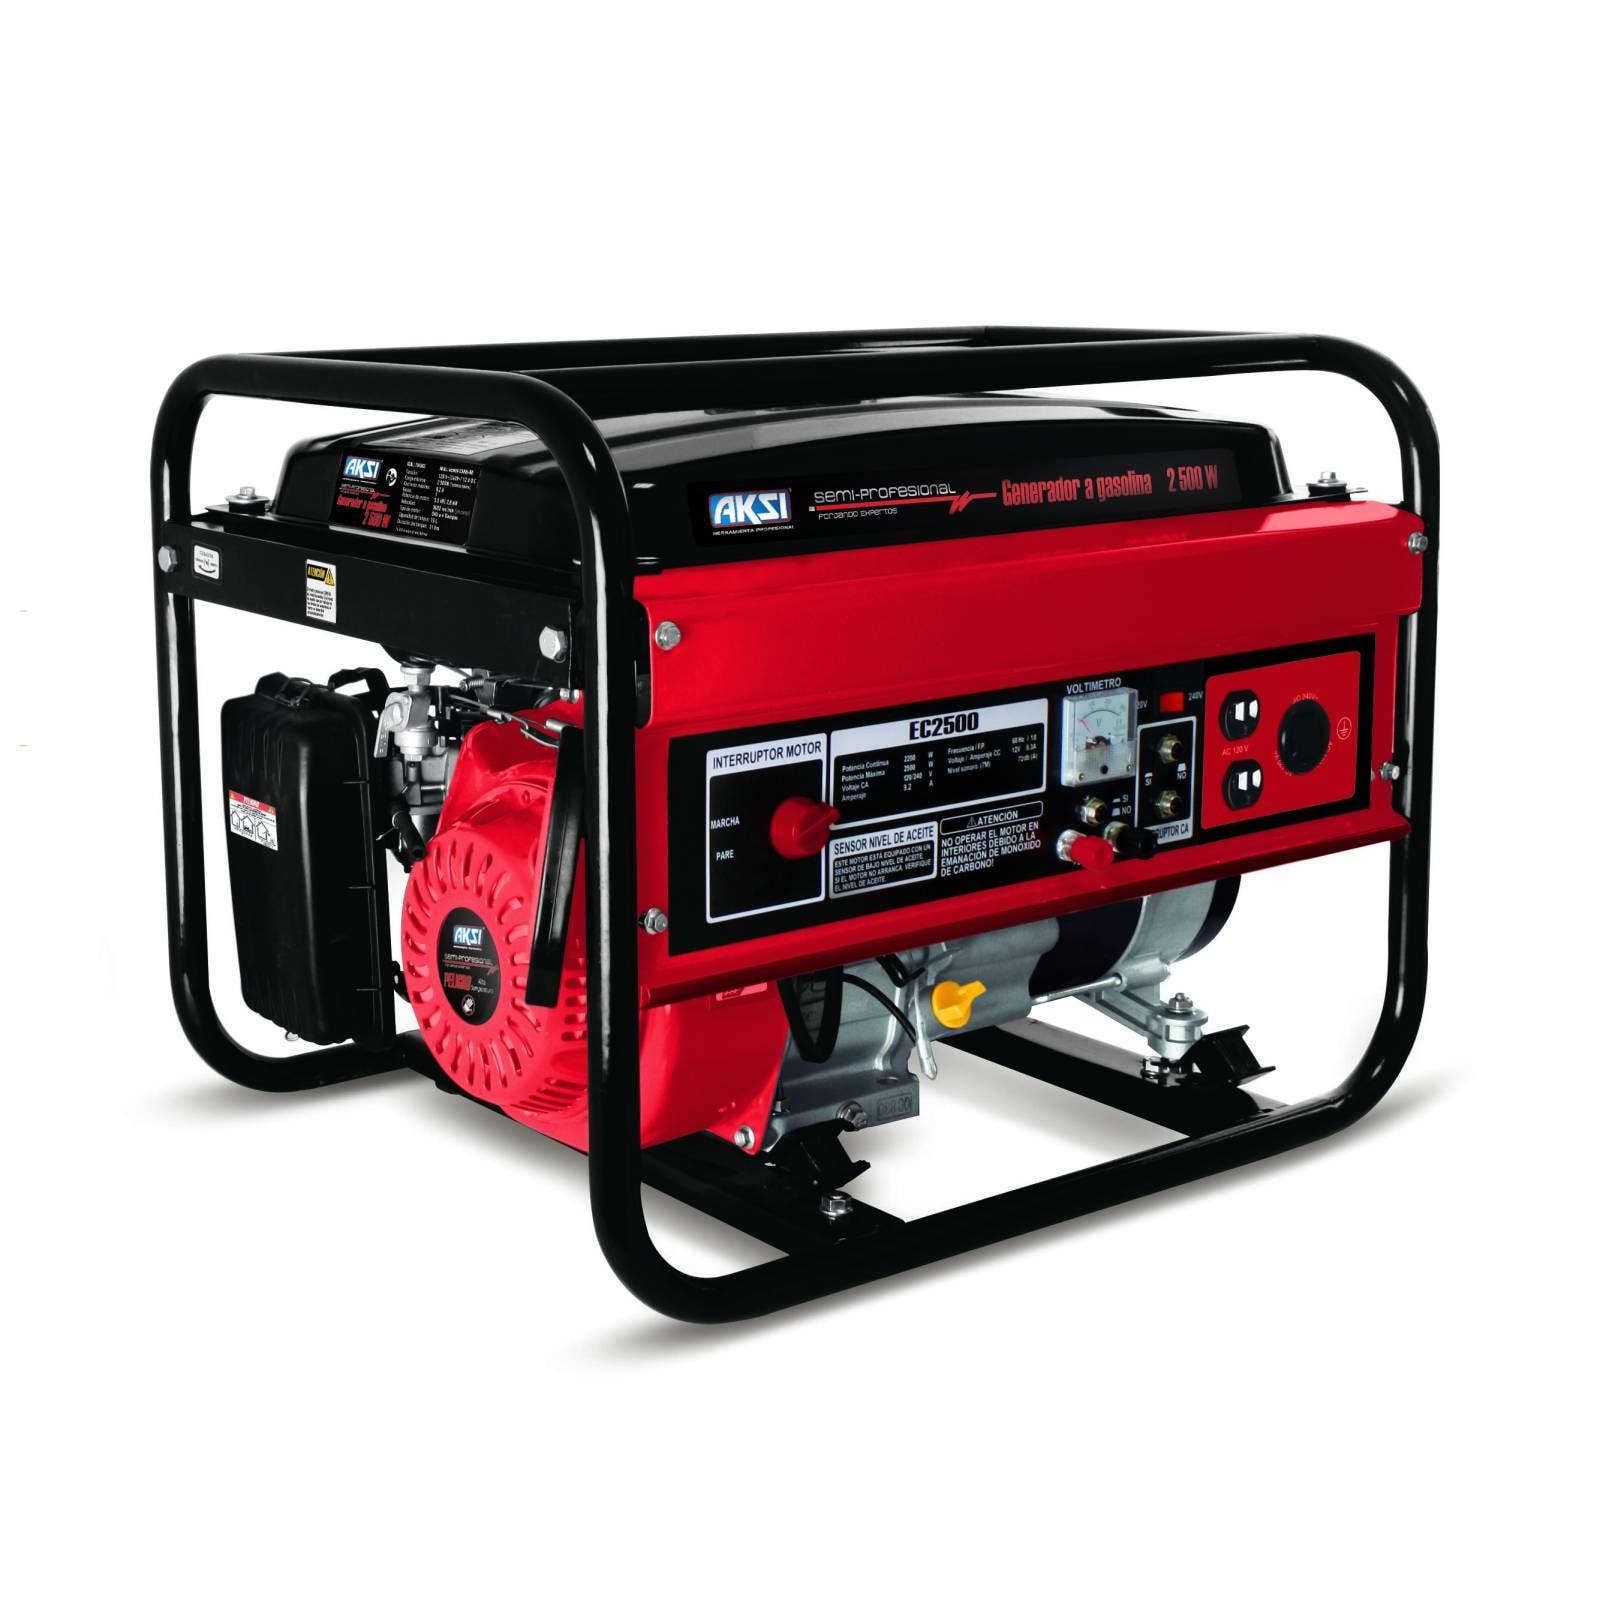 Generador Aksi Gasolina 2500w - Semi Pro